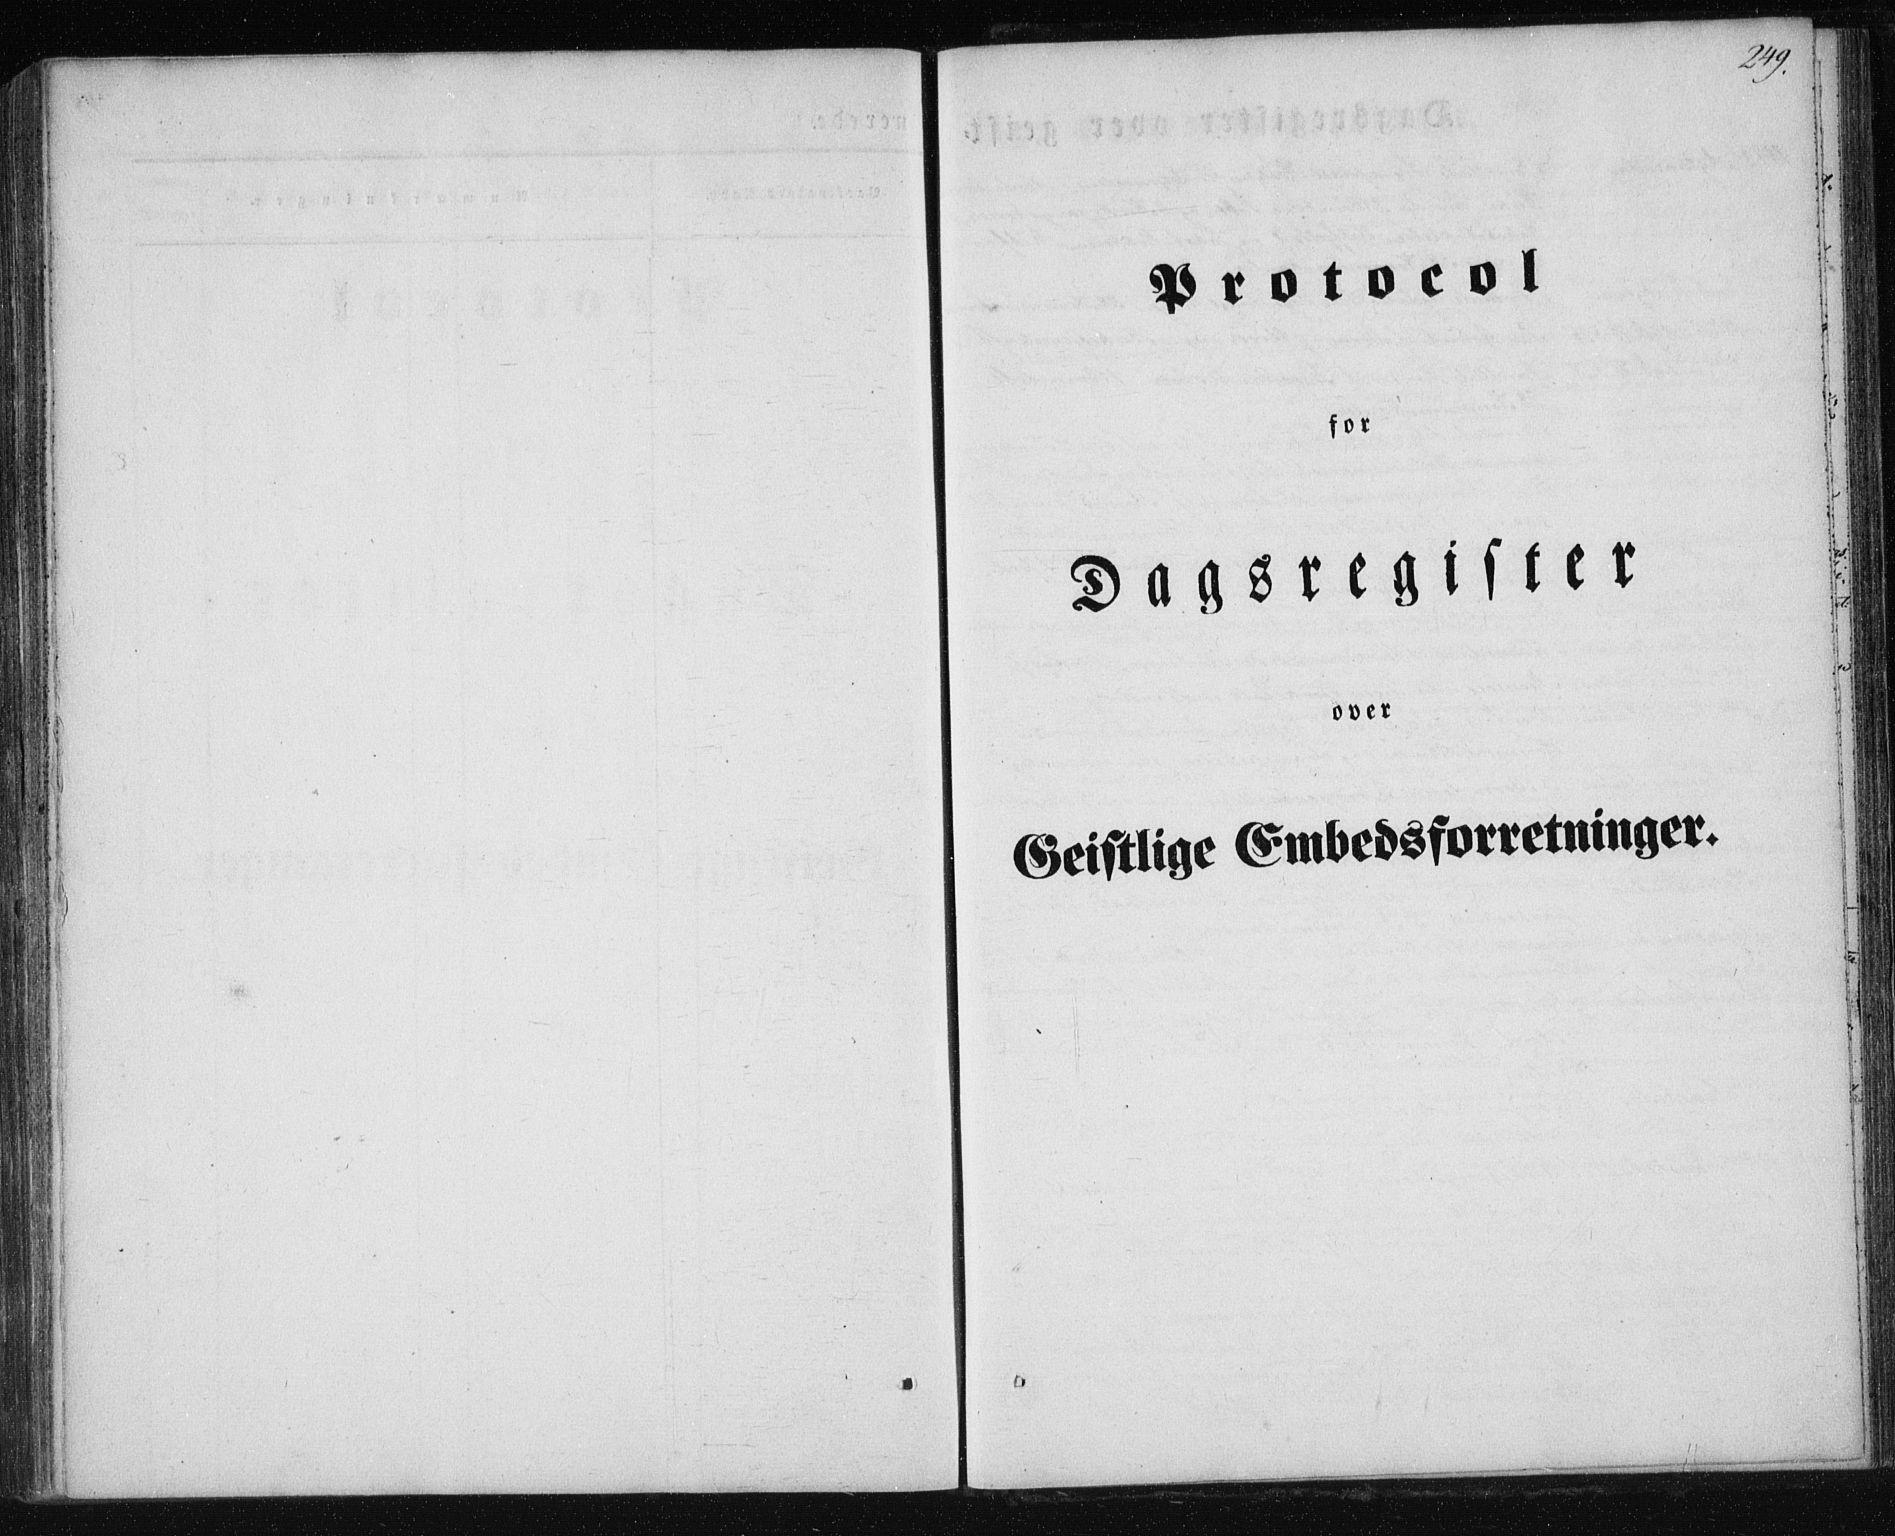 SAT, Ministerialprotokoller, klokkerbøker og fødselsregistre - Nordland, 827/L0391: Ministerialbok nr. 827A03, 1842-1852, s. 249